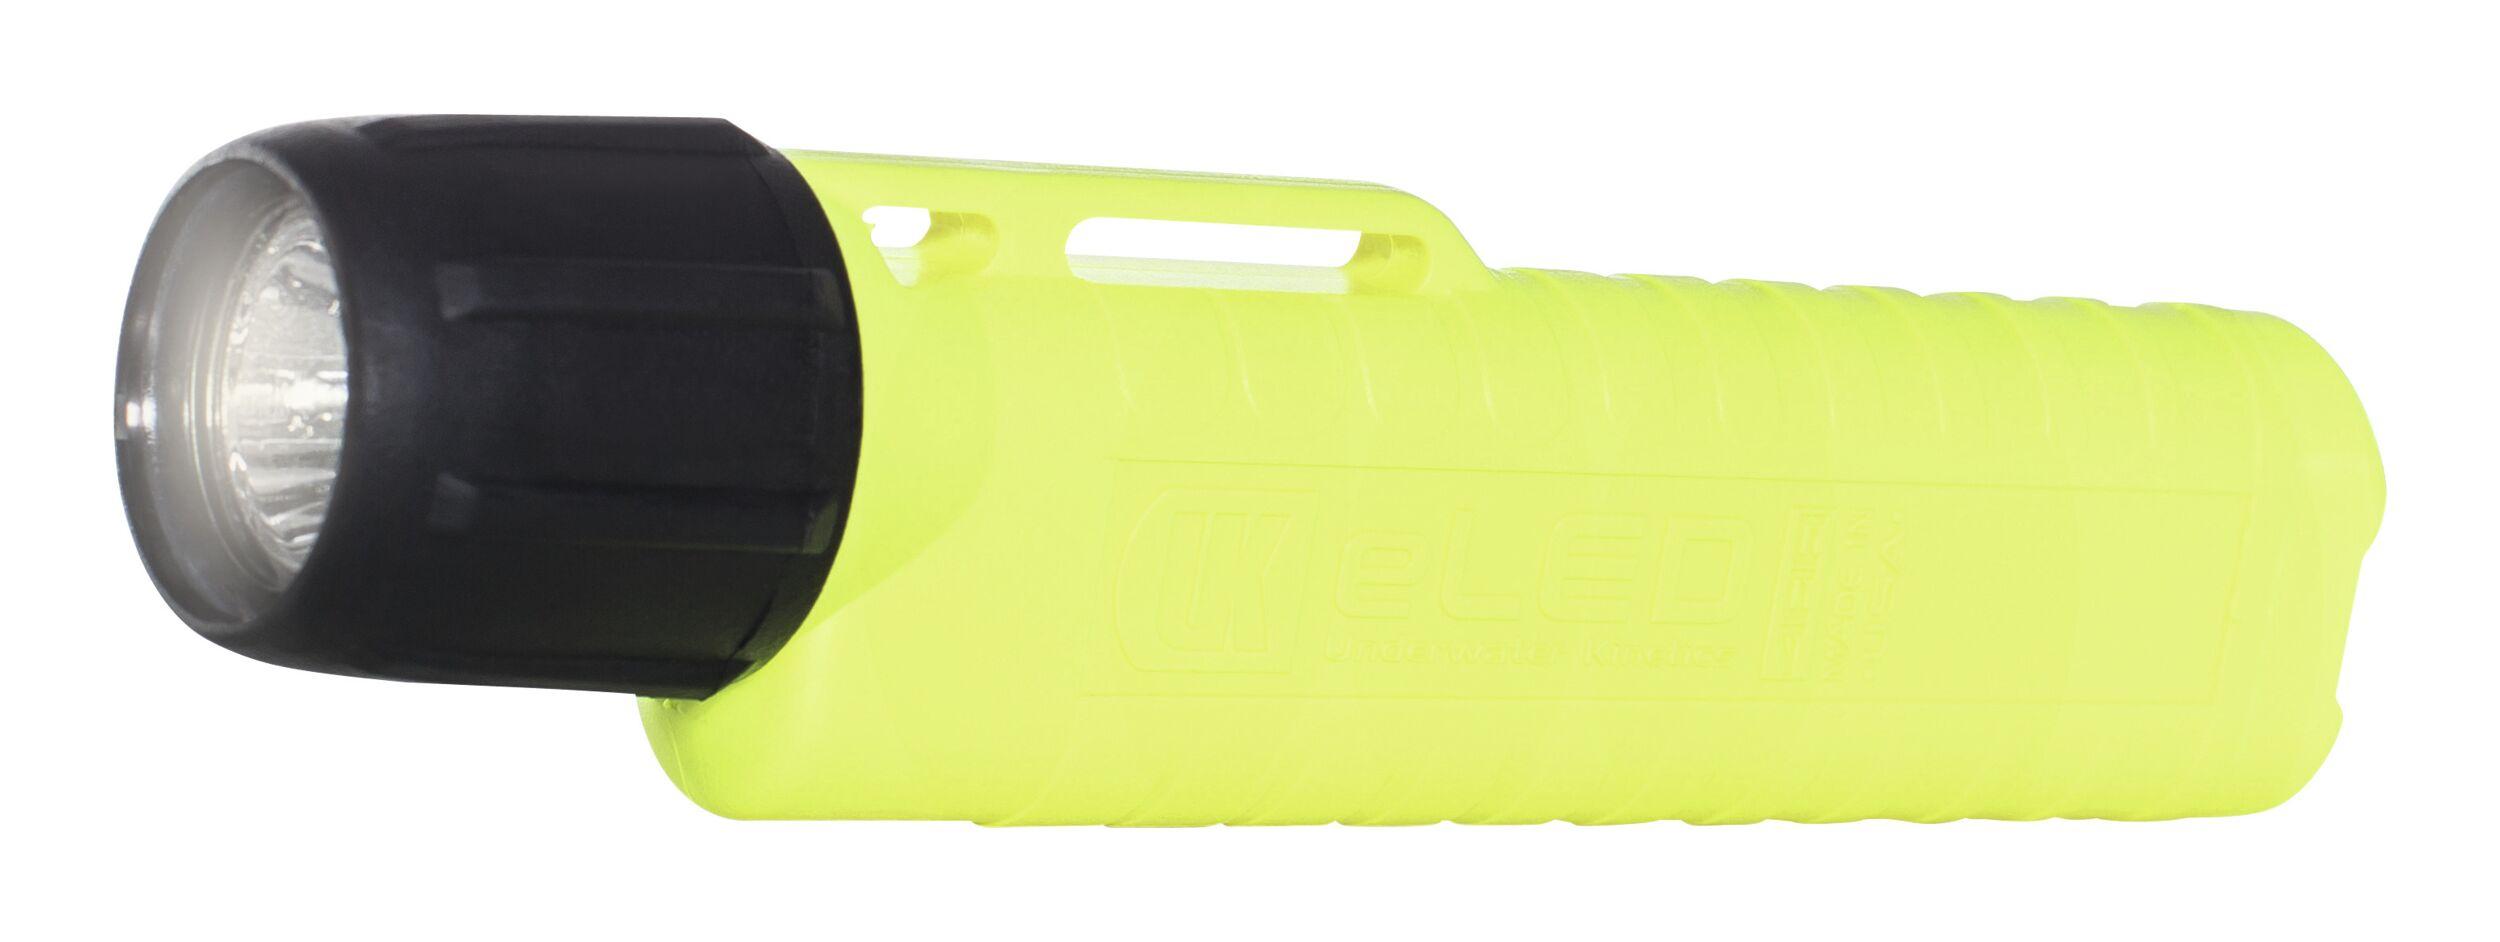 Helmlampe eLED RFL UK 4AA neongelb